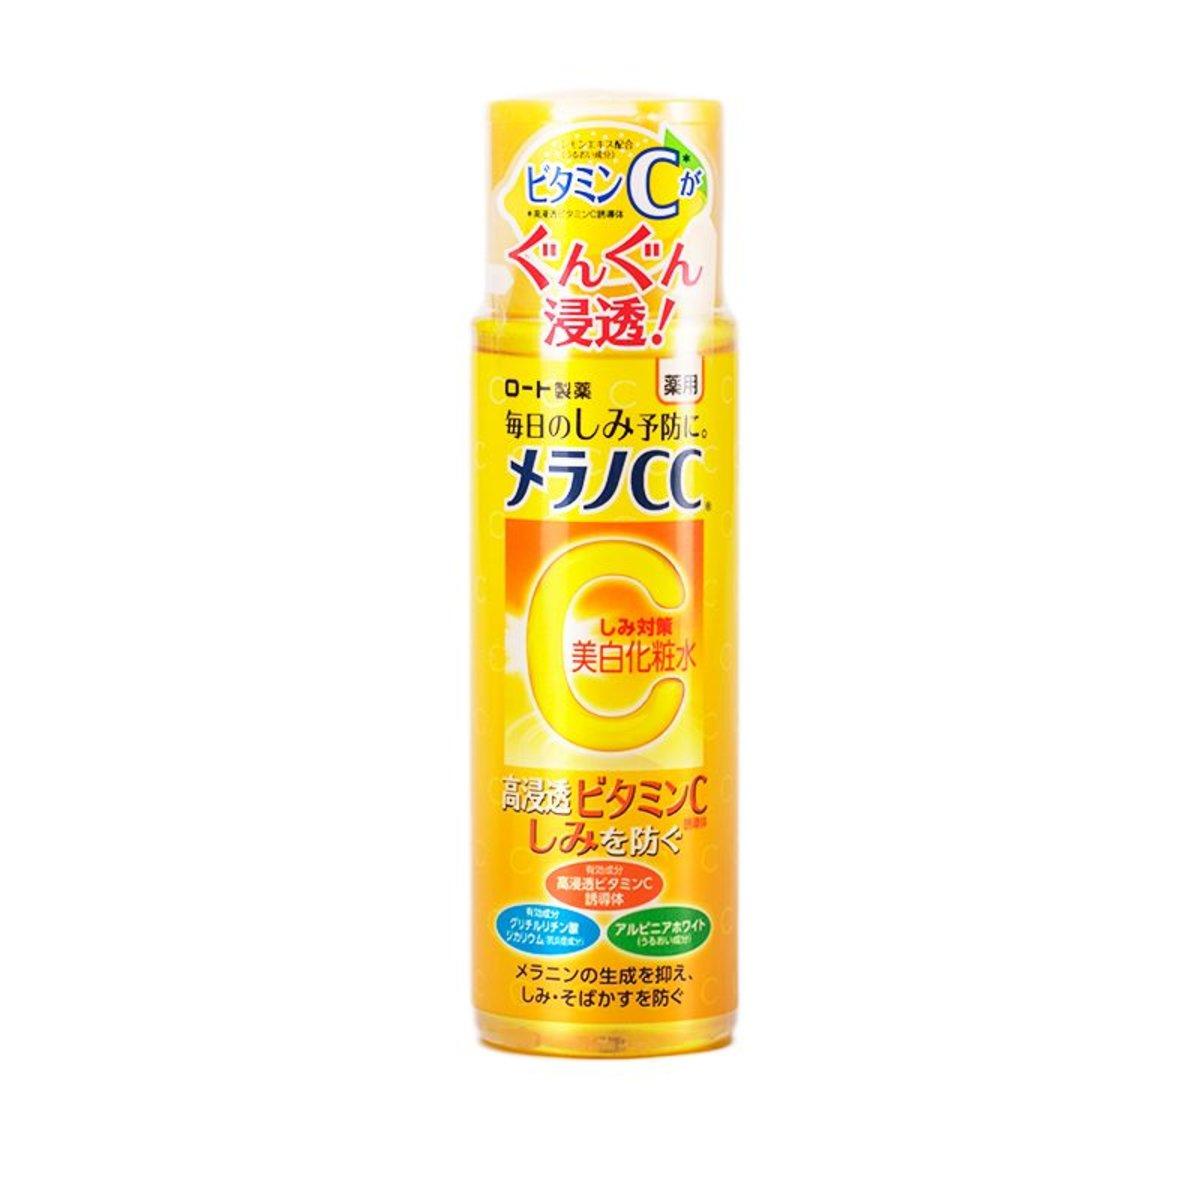 Melano CC藥用美白保濕化妝水 170ml (平行進口貨)